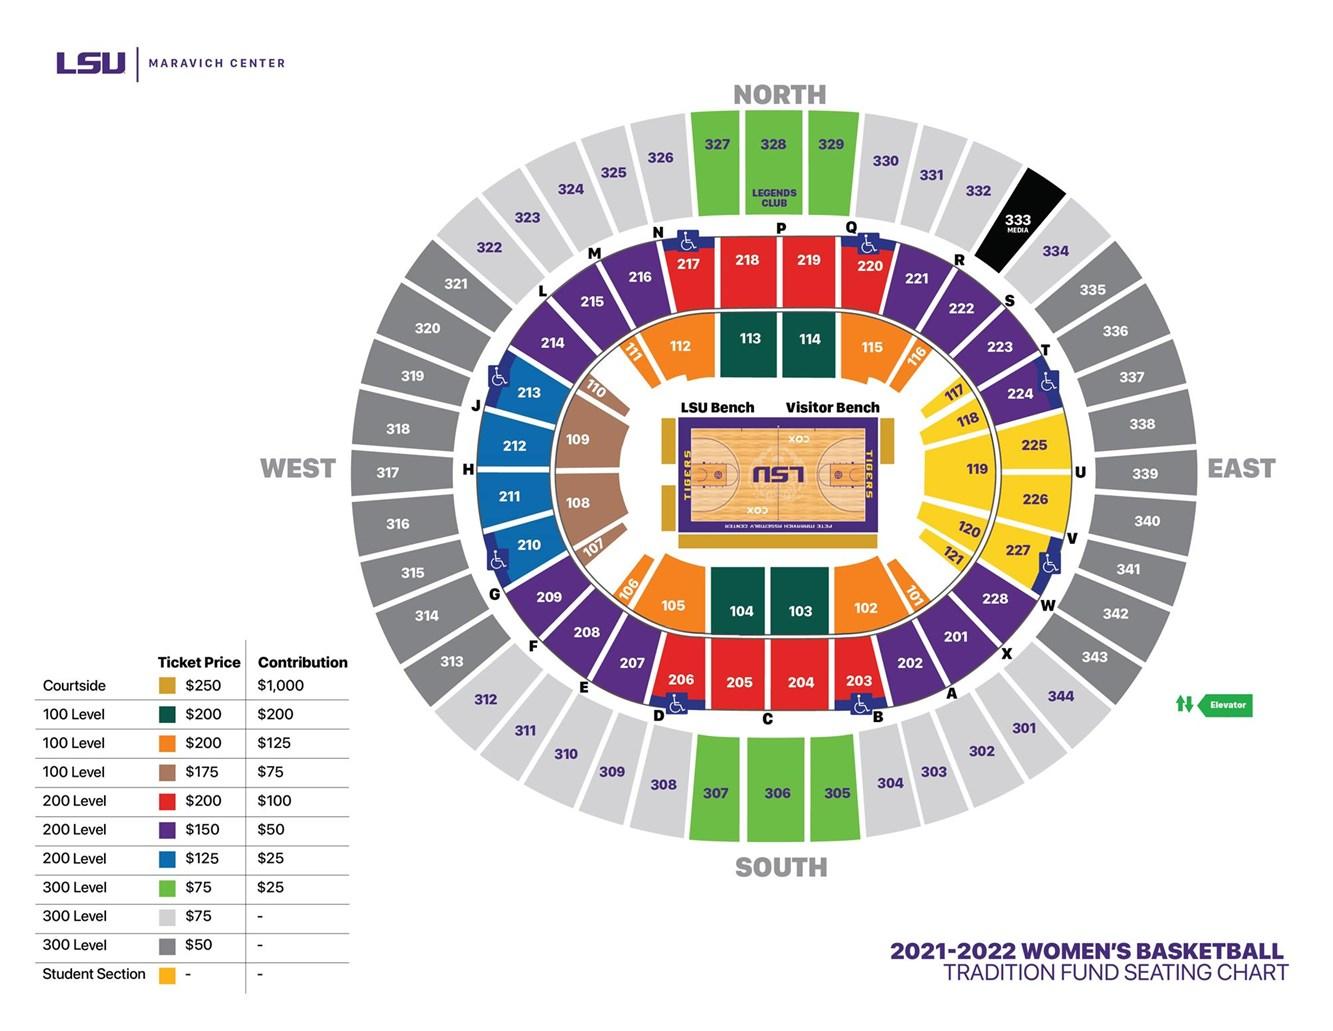 LSU Women's Basketball Tradition Fund Seating Chart - Maravich Center